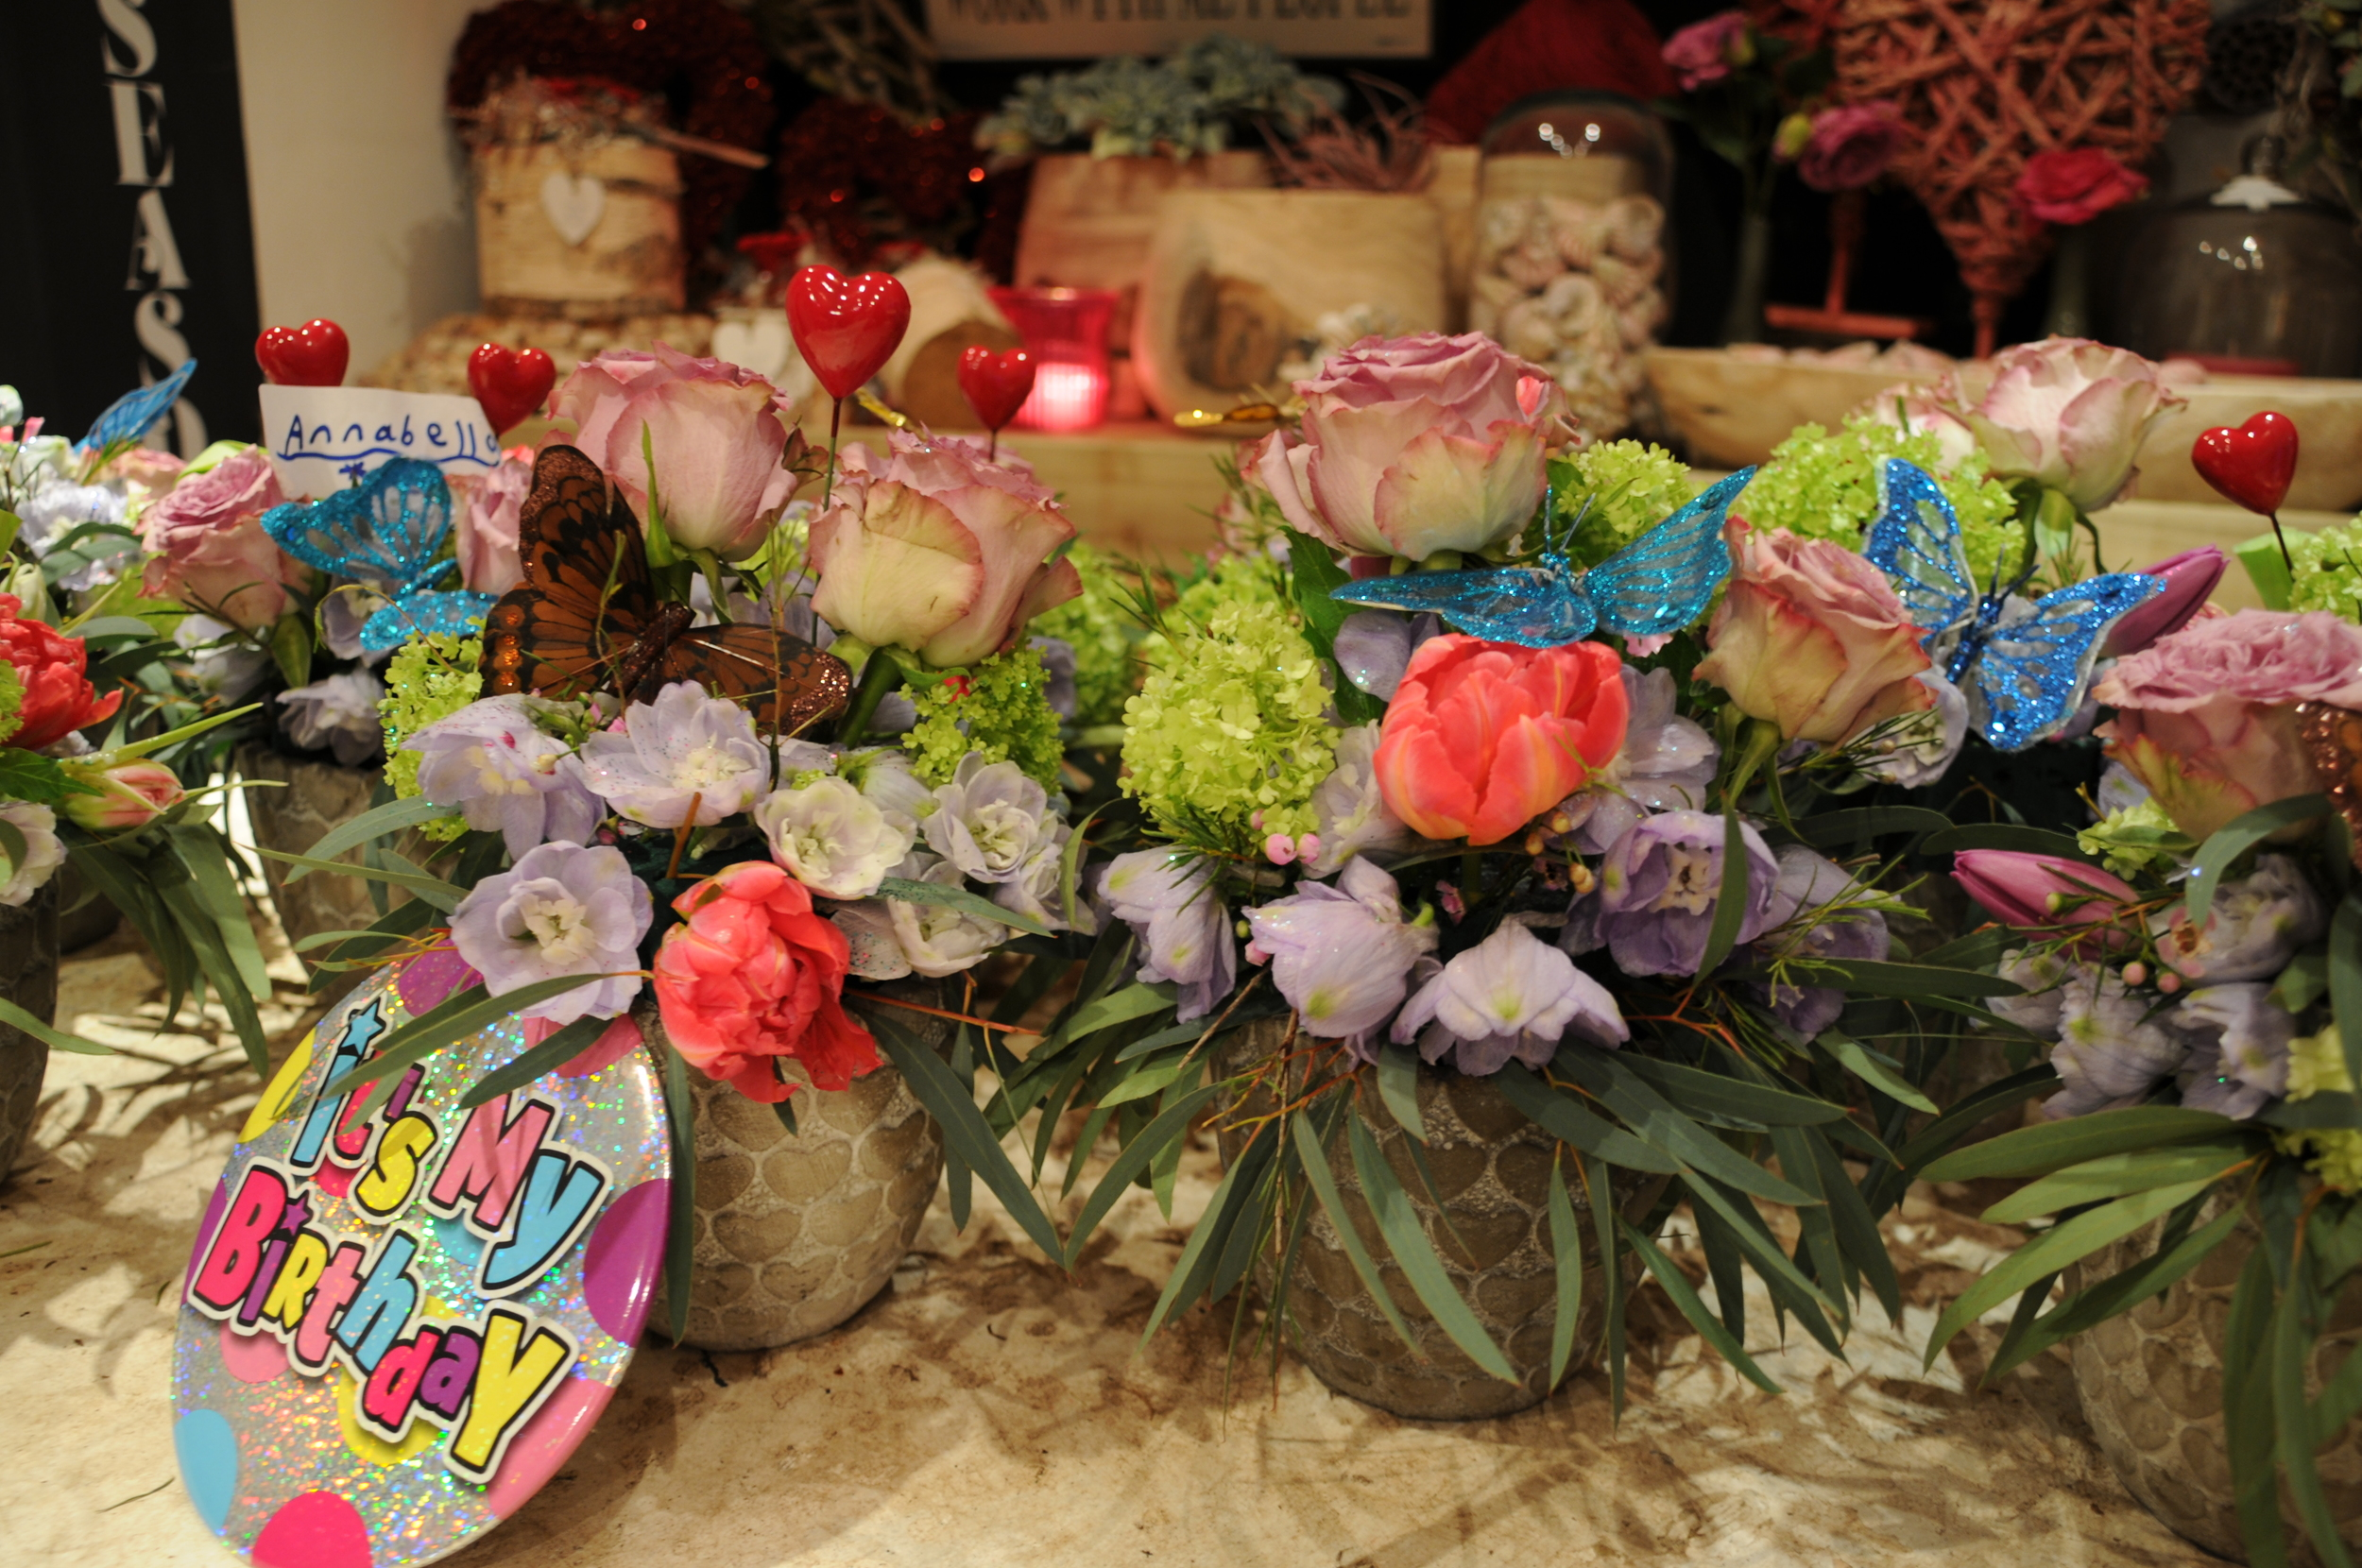 Dutch Floral Design childrens party workshop.